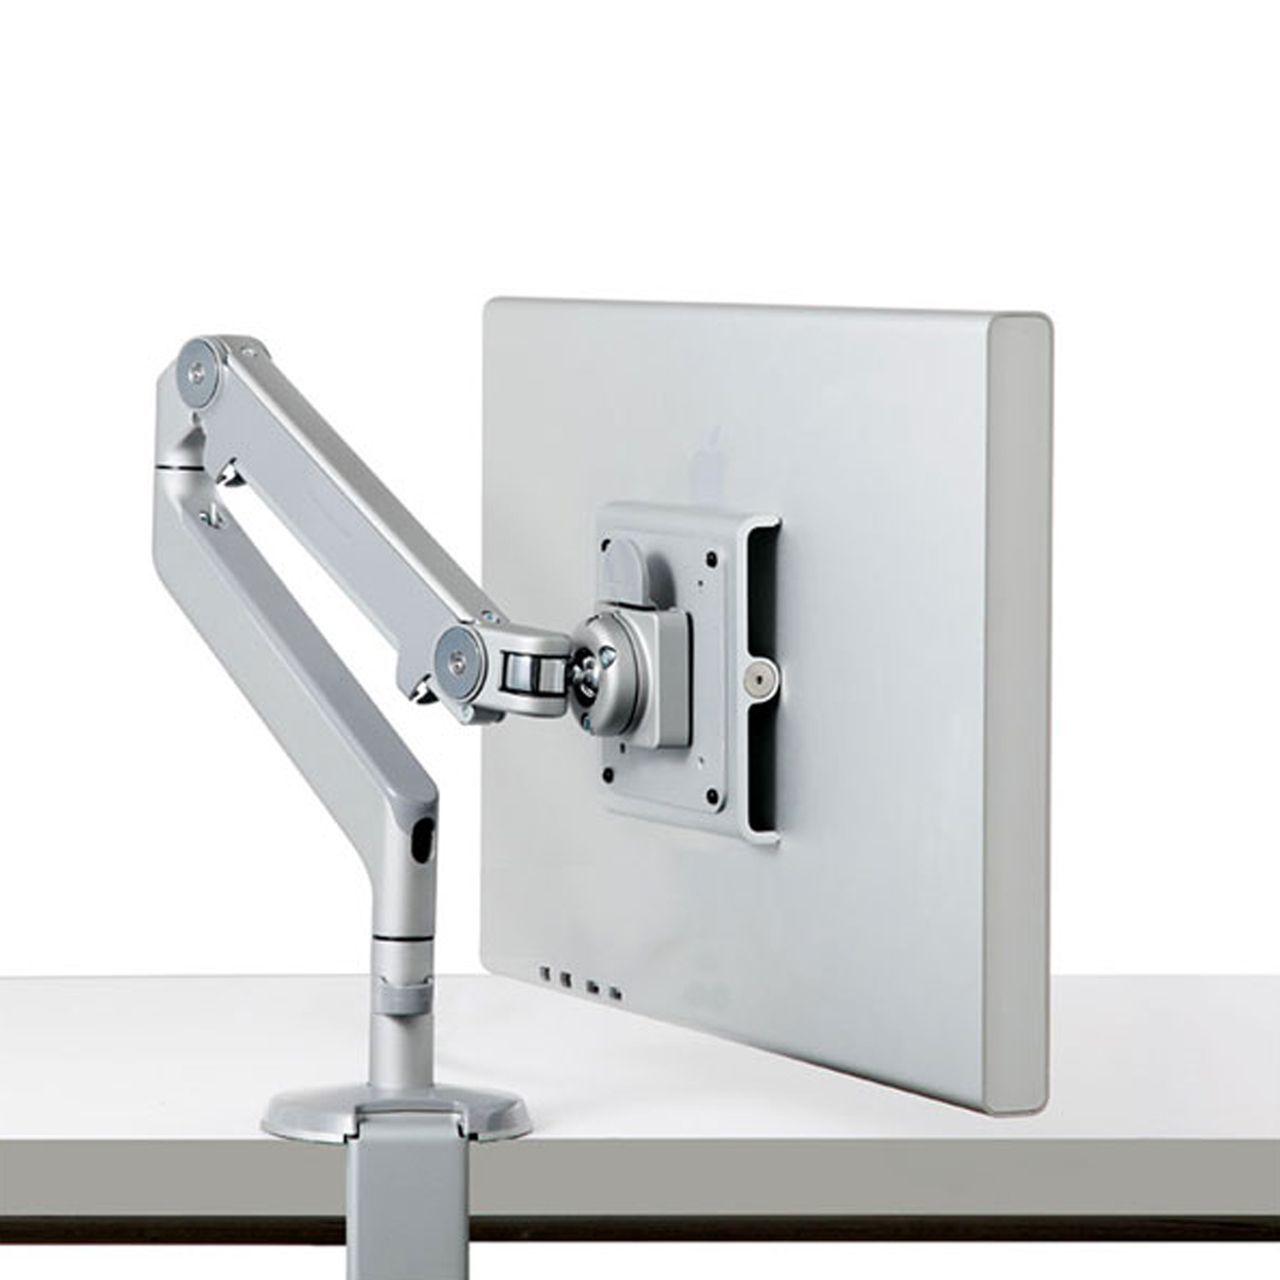 Humanscale M2 enkele monitorarm